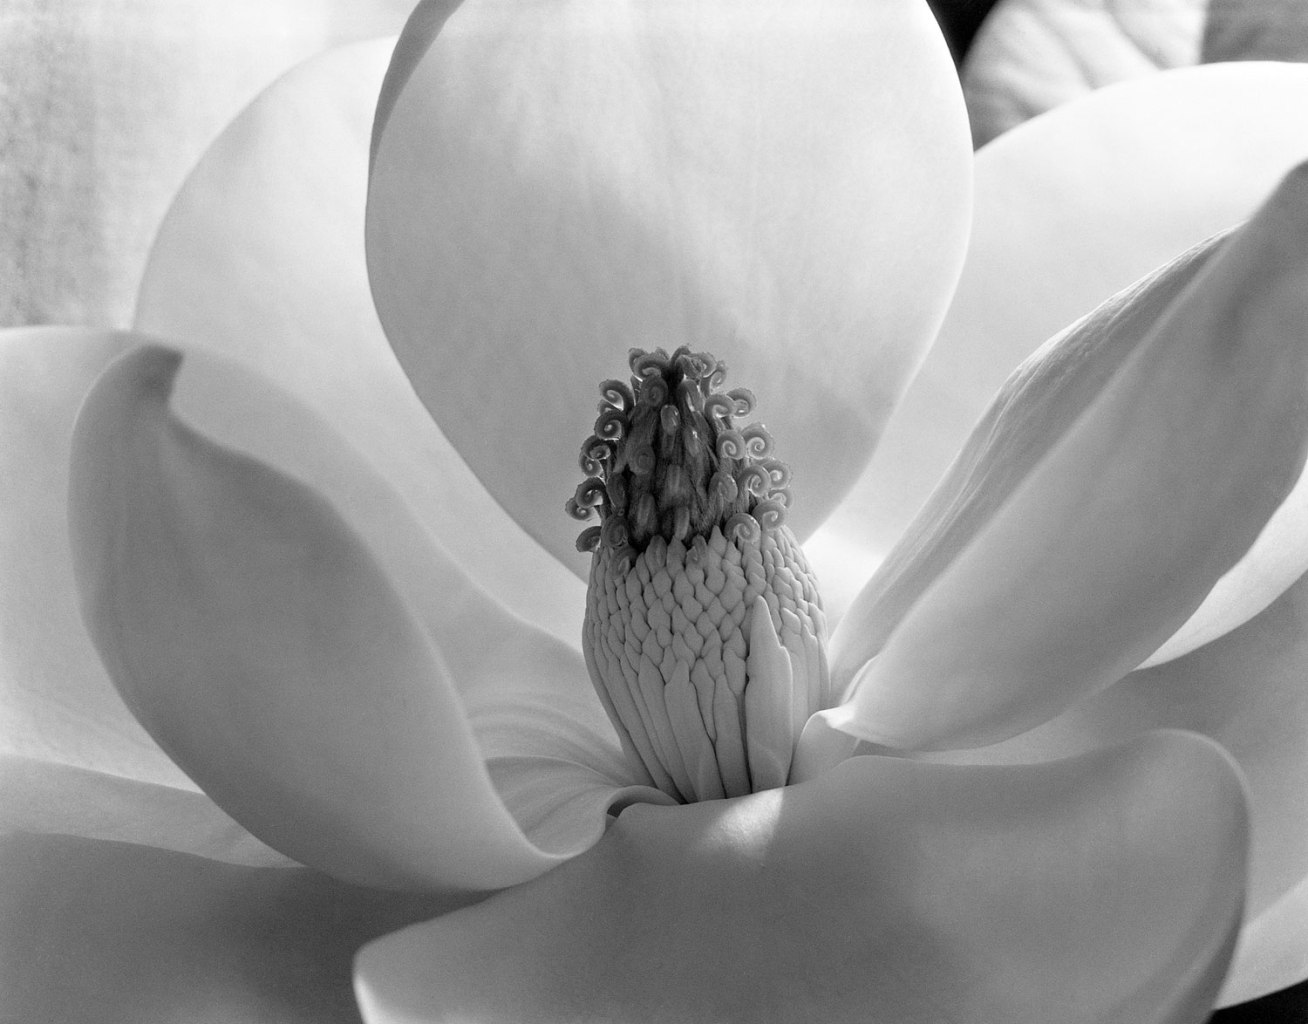 Fotó: Imogen Cunningham: Magnolia Blossom, 1925, Gelatin silver print ©T he Imogen Cunningham Trust, 2012